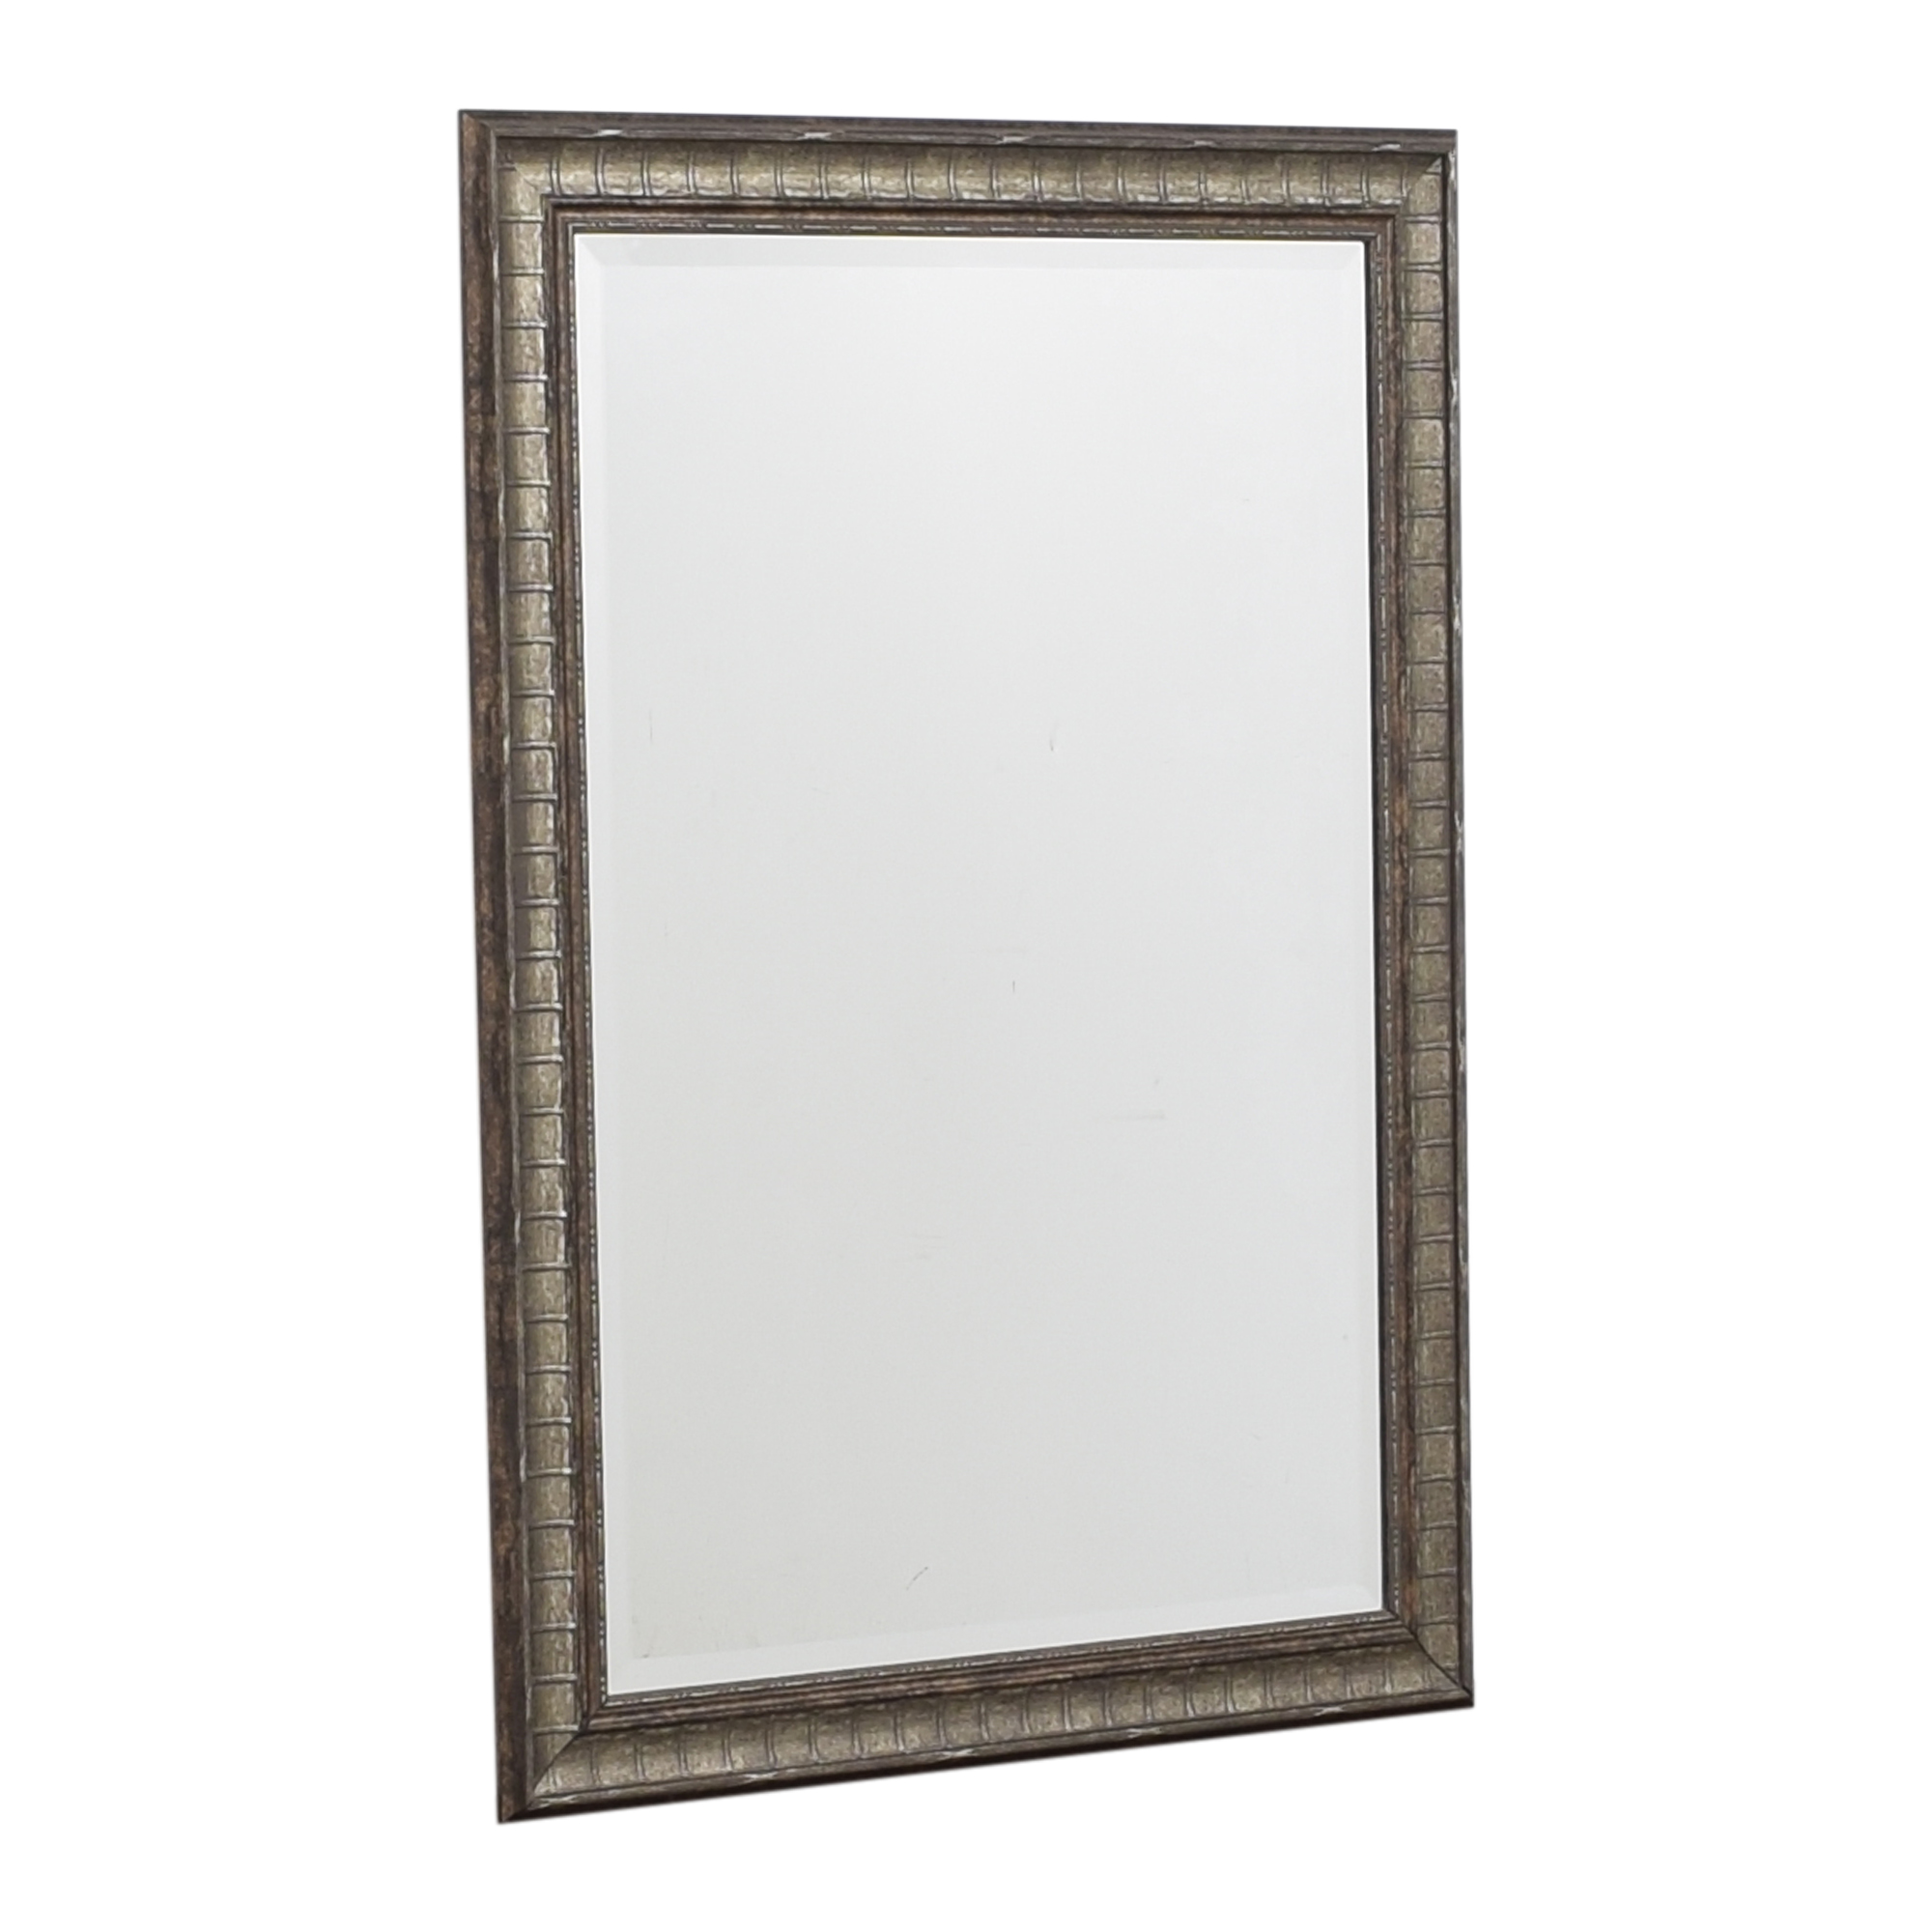 Macy's Macy's Wall Mirror price